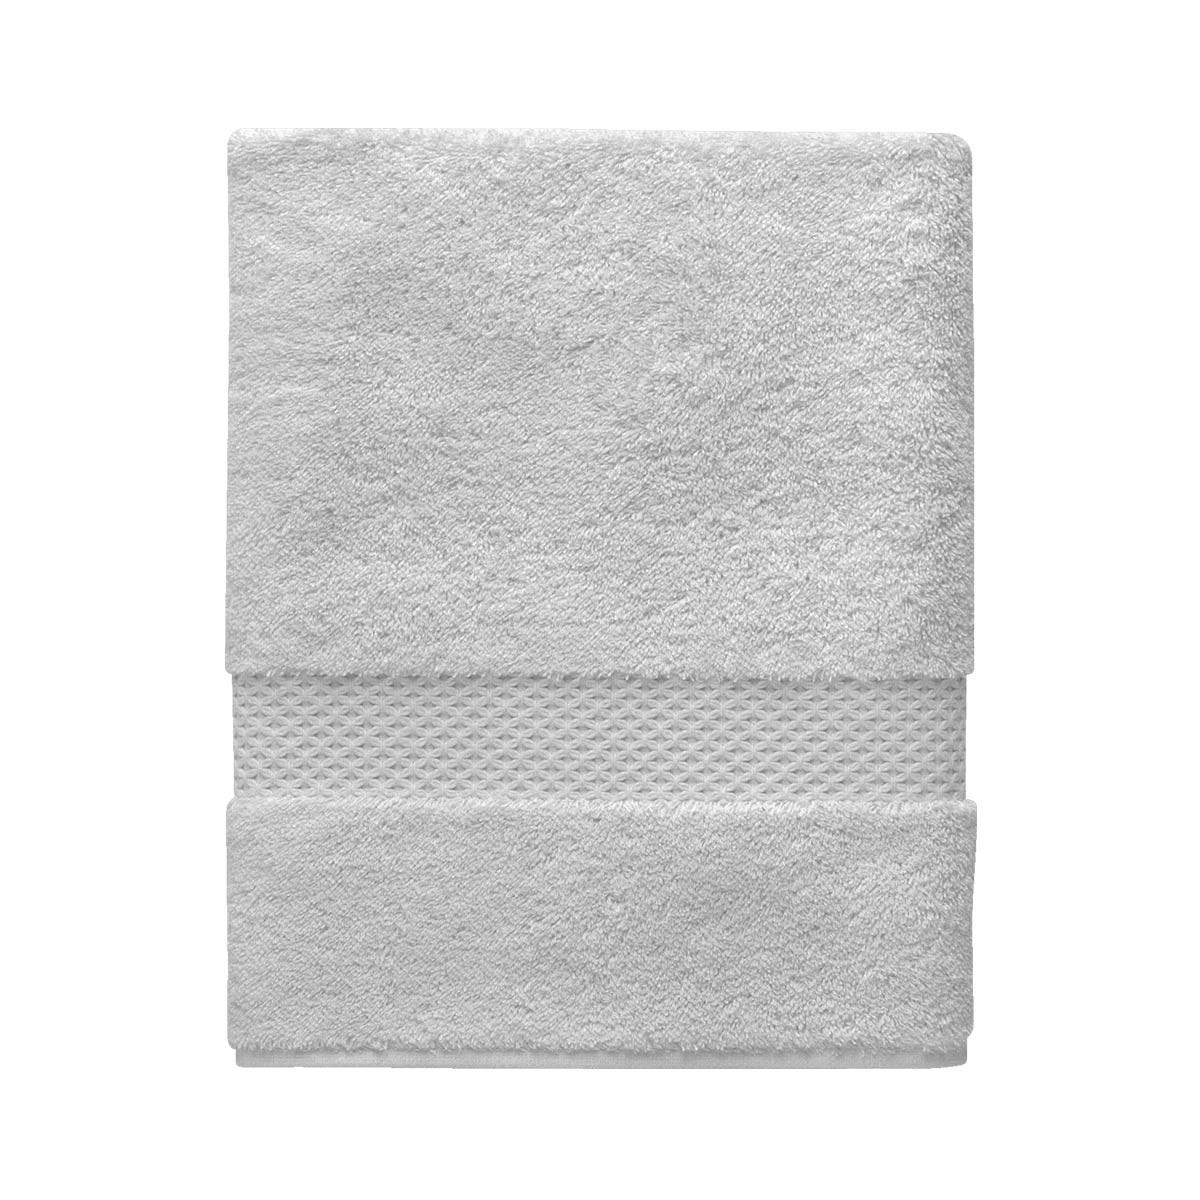 Etoile Silver Bath Towel 70x140cm